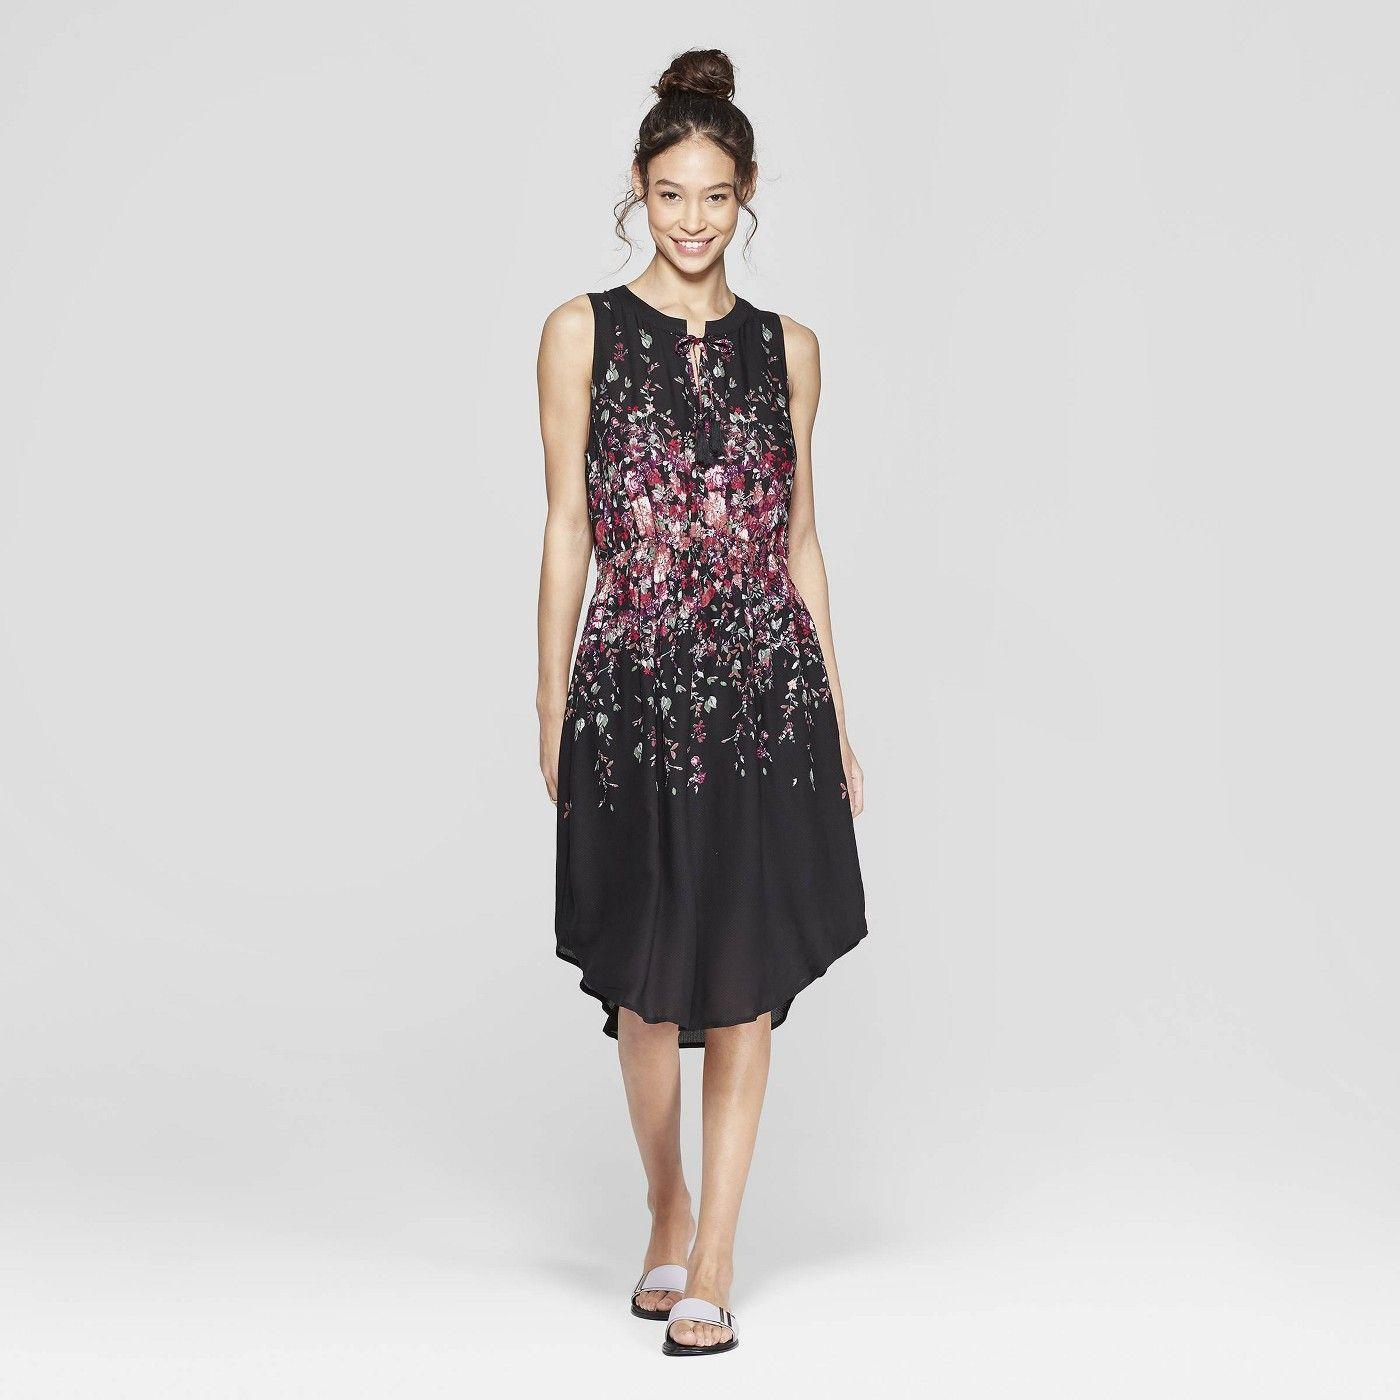 Women S Floral Print Sleeveless V Neck Cinched Waist Midi Dress Xhilaration Black Target Floral Dress Black Fit And Flare Dress Dresses [ 1400 x 1400 Pixel ]